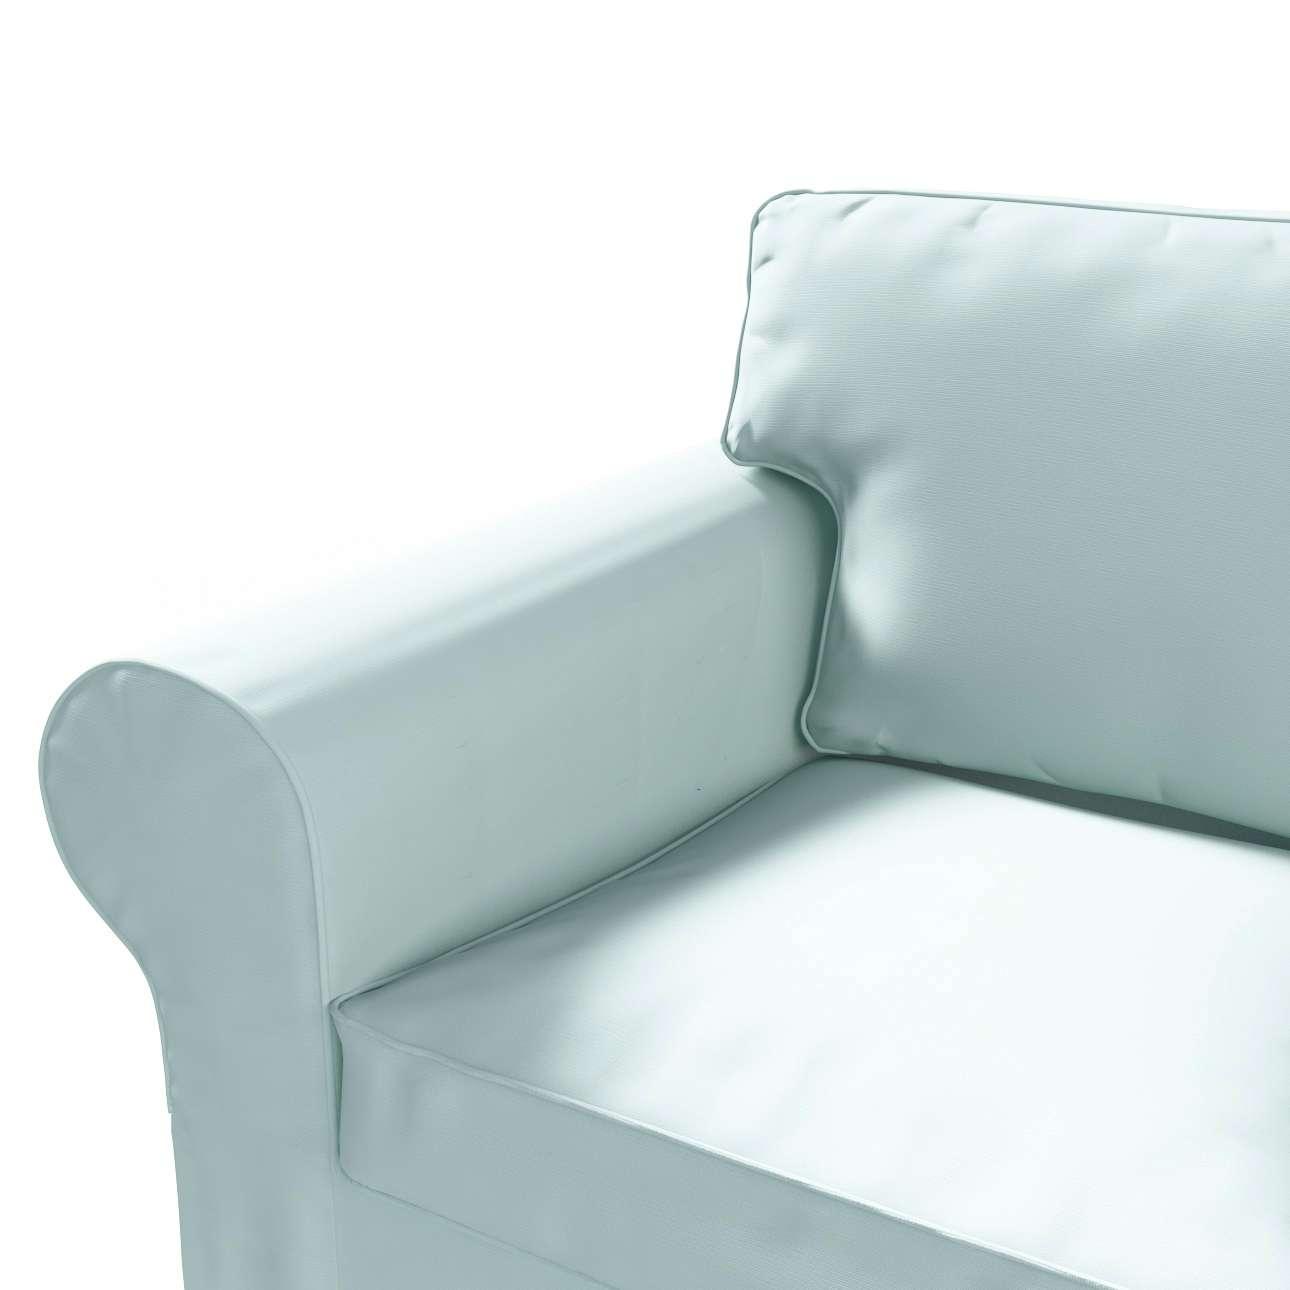 Ektorp 2 sæder sovesofa gammel model<br/>Bredde ca 195cm Betræk uden sofa fra kollektionen Cotton Panama, Stof: 702-10